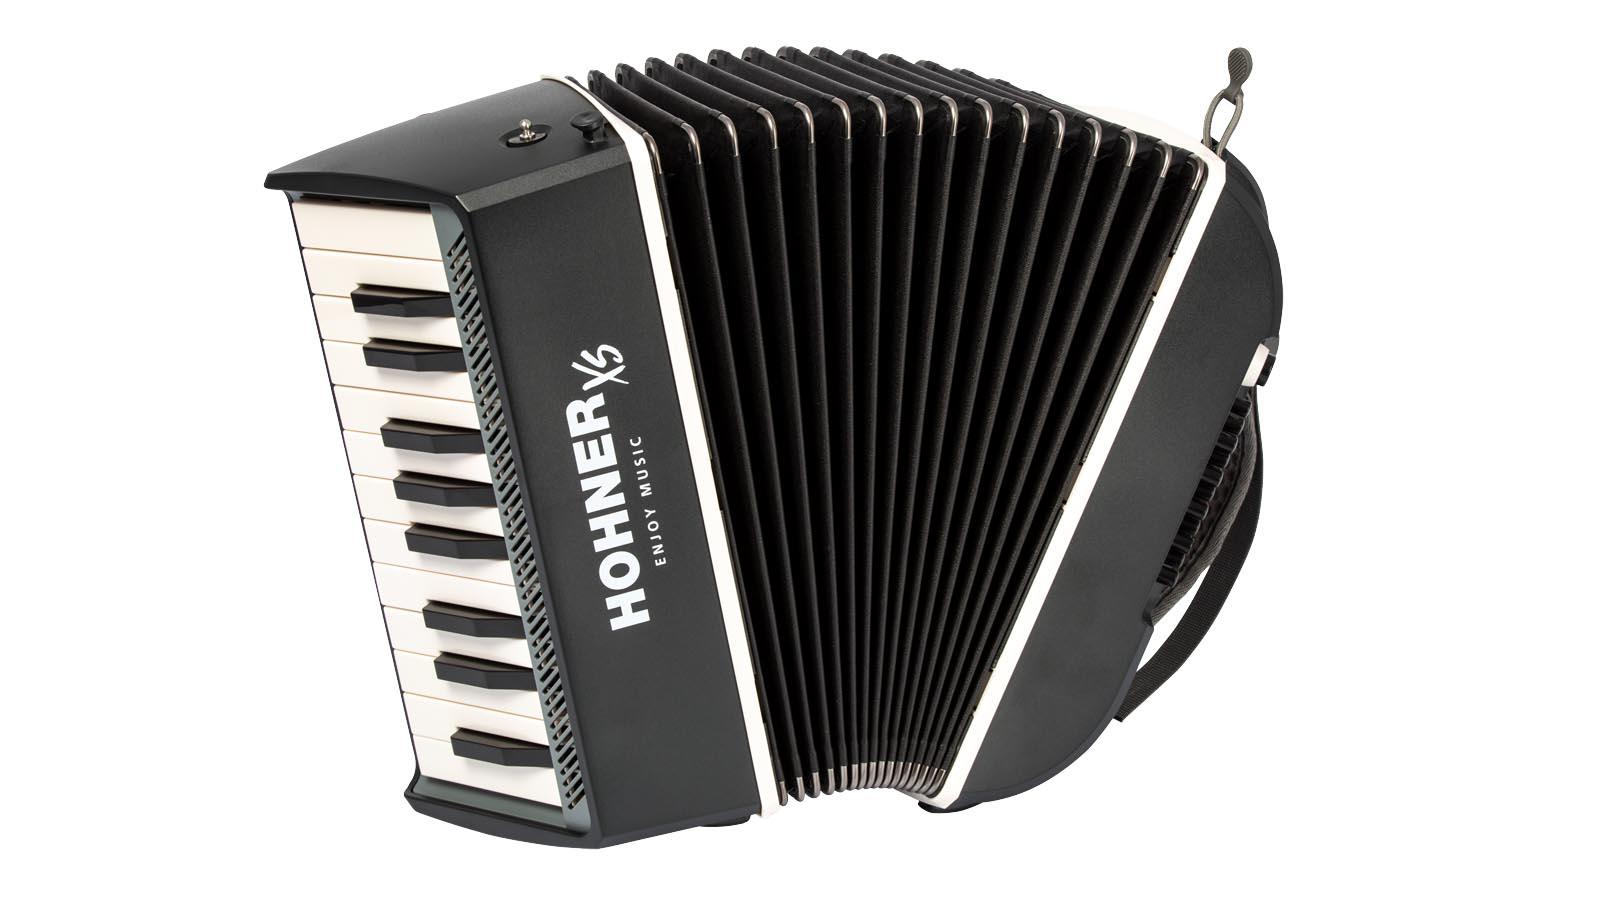 Hohner Akkordeon XS Weiß- Grau